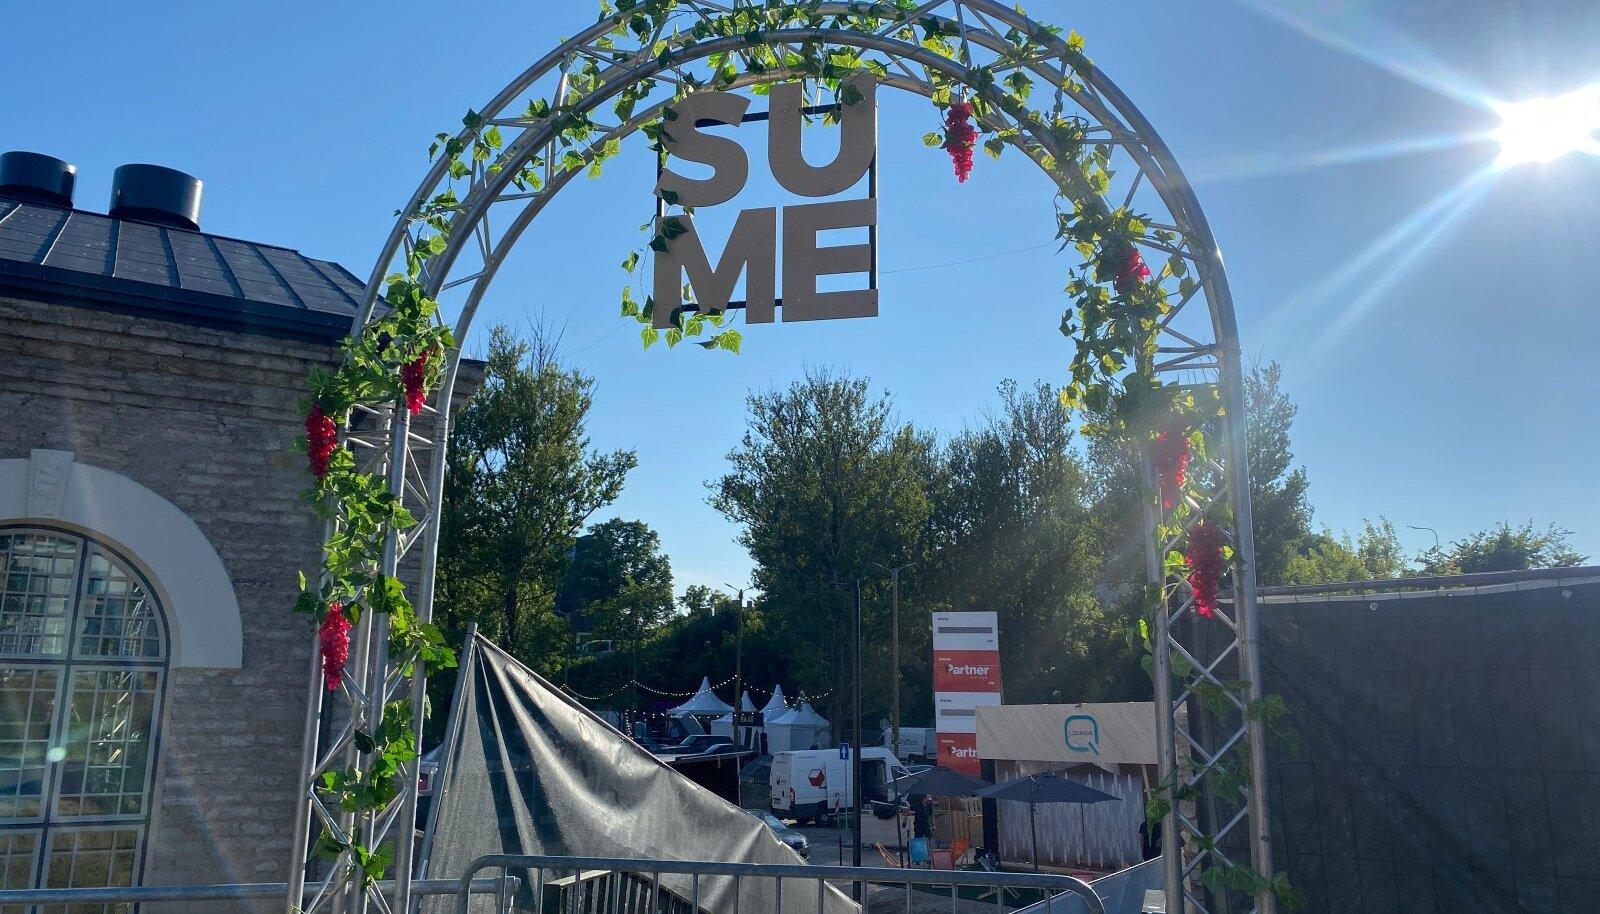 SUME festival 2021